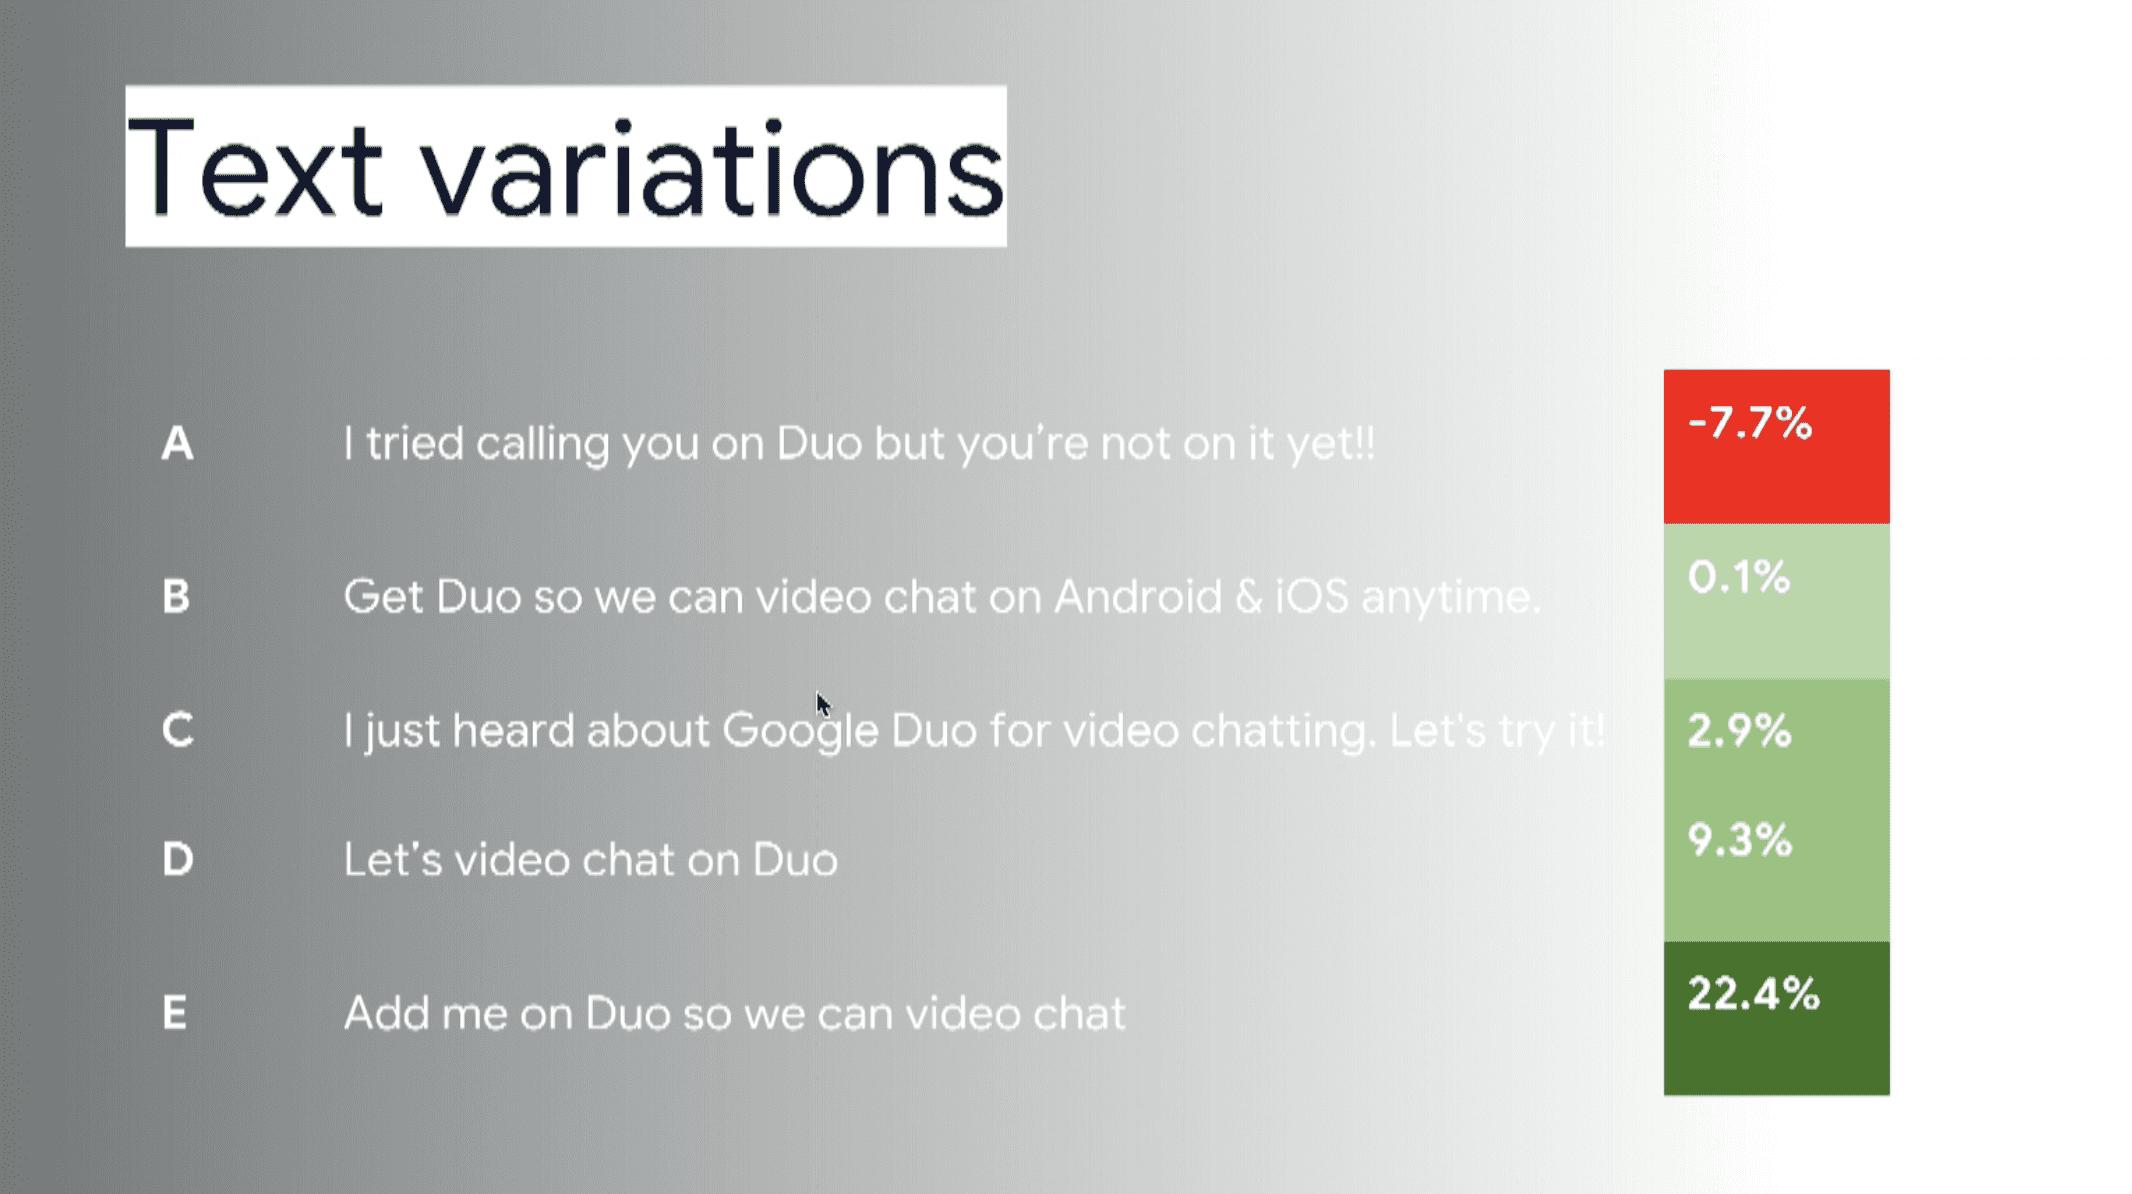 UX Writer เขียนอย่างไรให้คนอยากดาวน์โหลด Case study จาก Google Duo SMS Invites